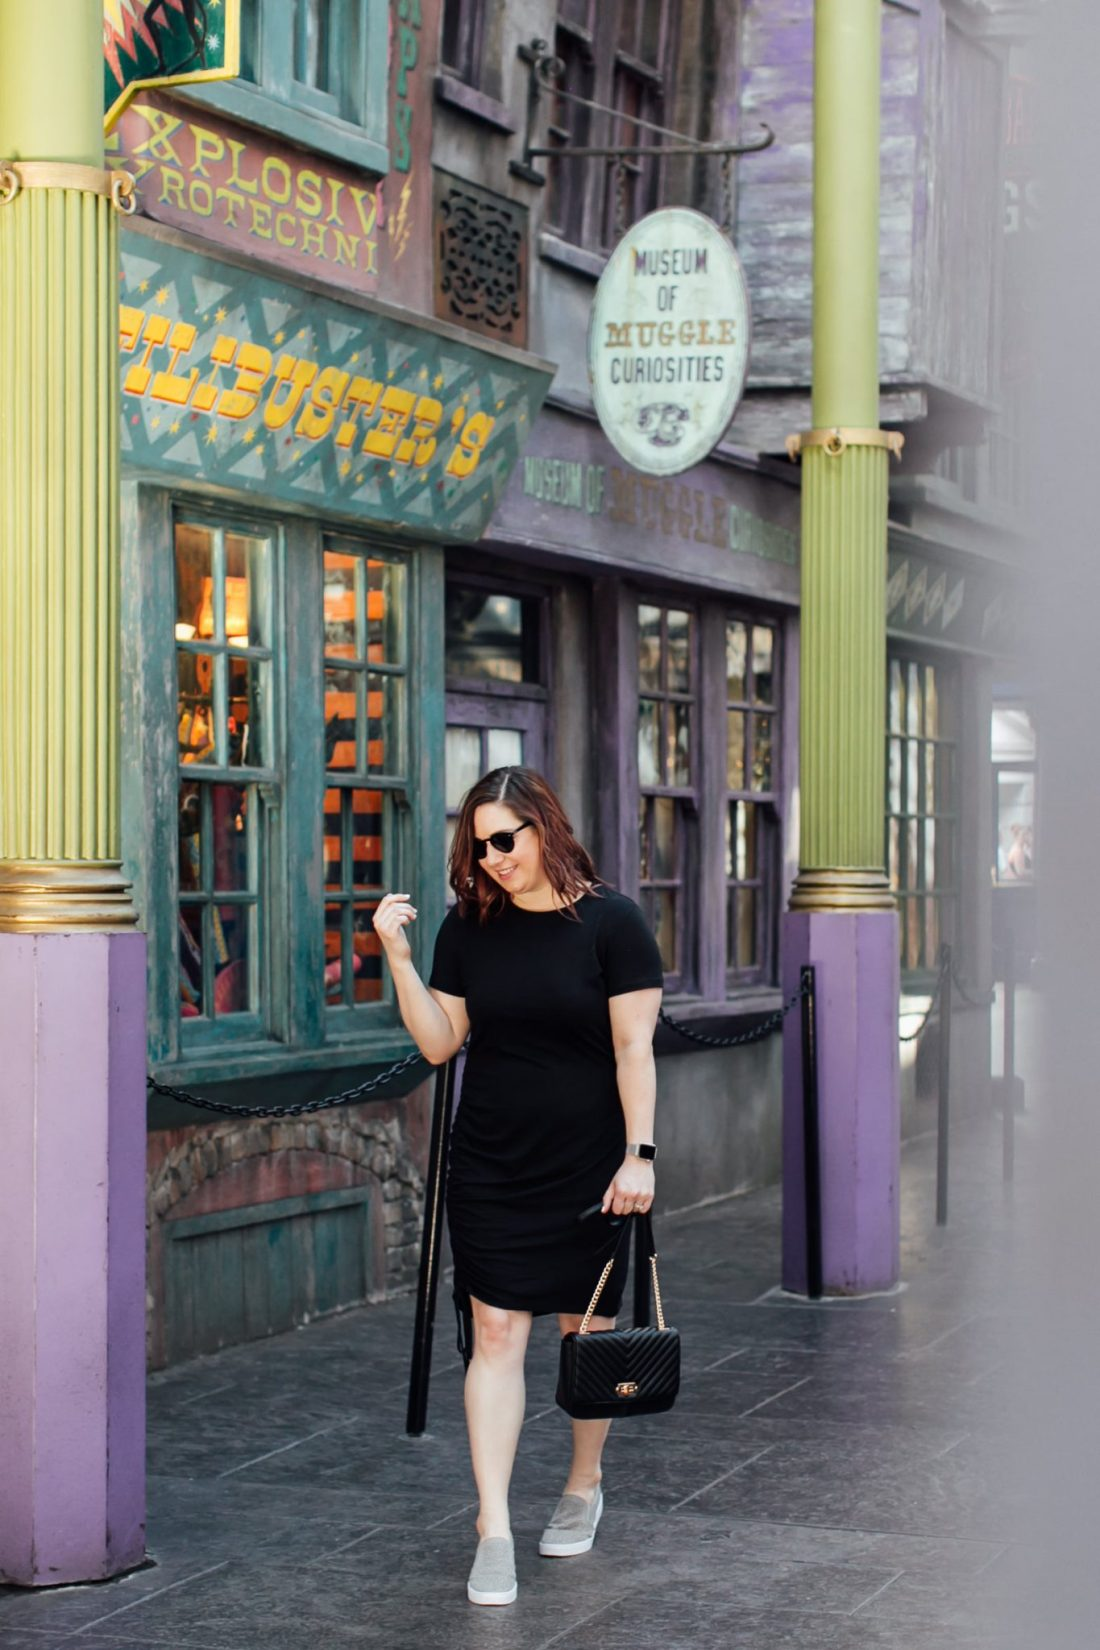 Universal Orlando // Miss Molly Moon